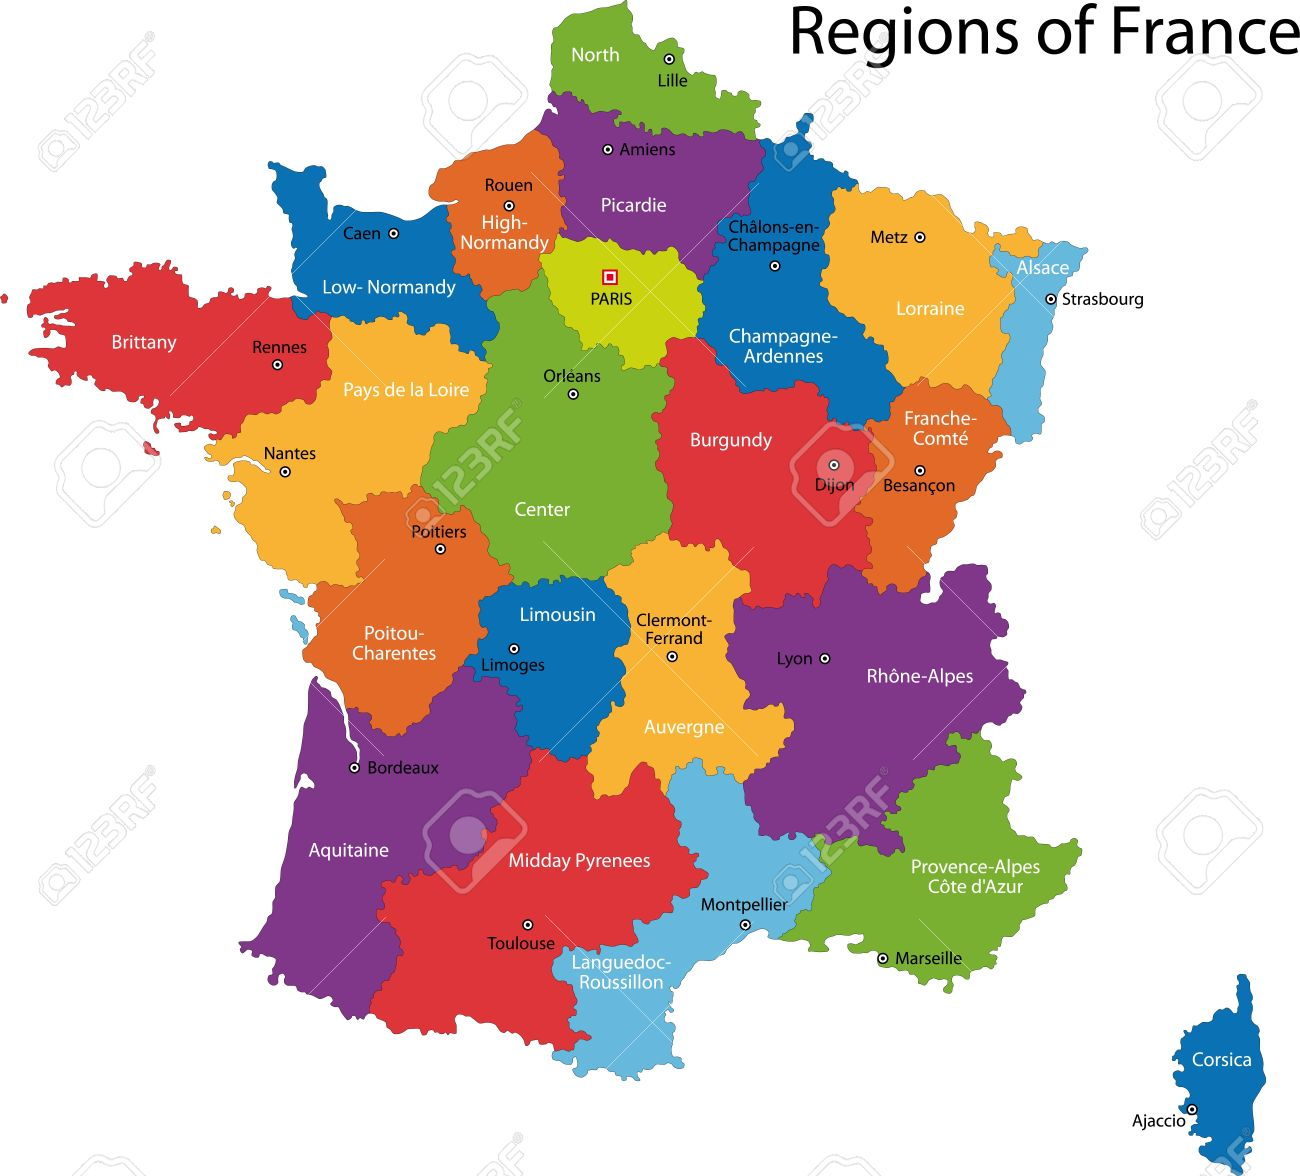 frankrike karta regioner Colorful France Map With Regions And Main Cities Royalty Fri  frankrike karta regioner